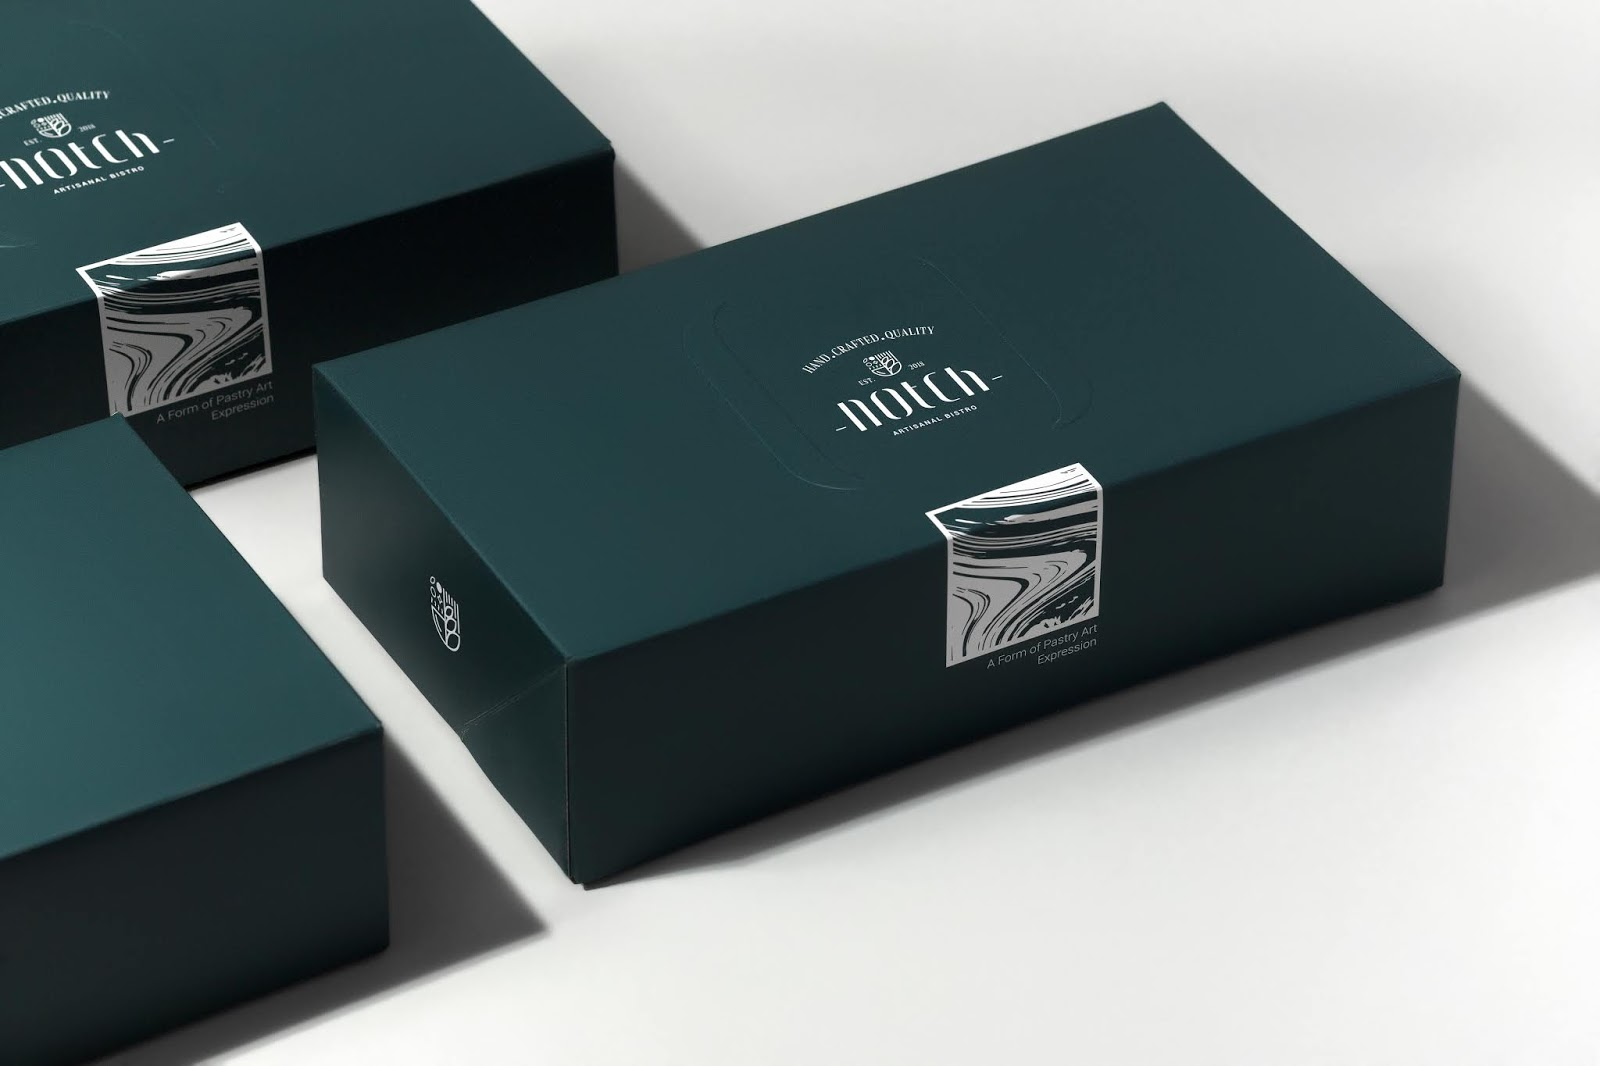 NOTCH咖啡书型盒